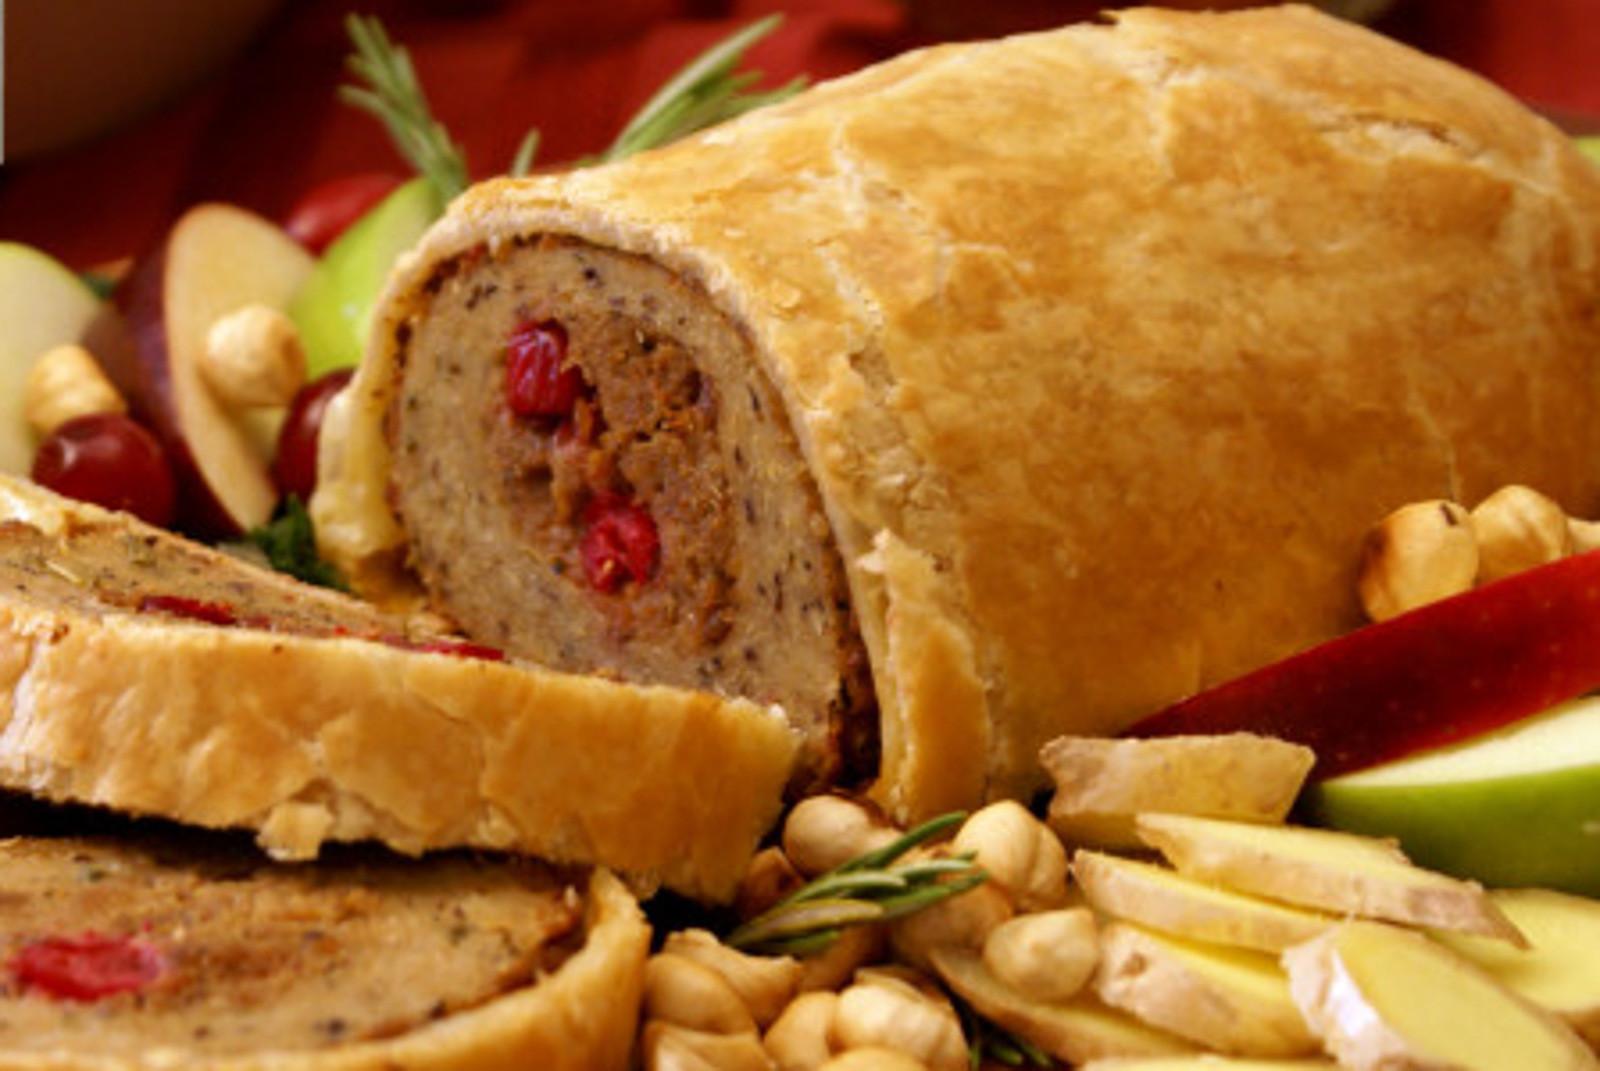 Thanksgiving Turkey Alternatives  The Best Meatless Turkey Alternatives for Thanksgiving